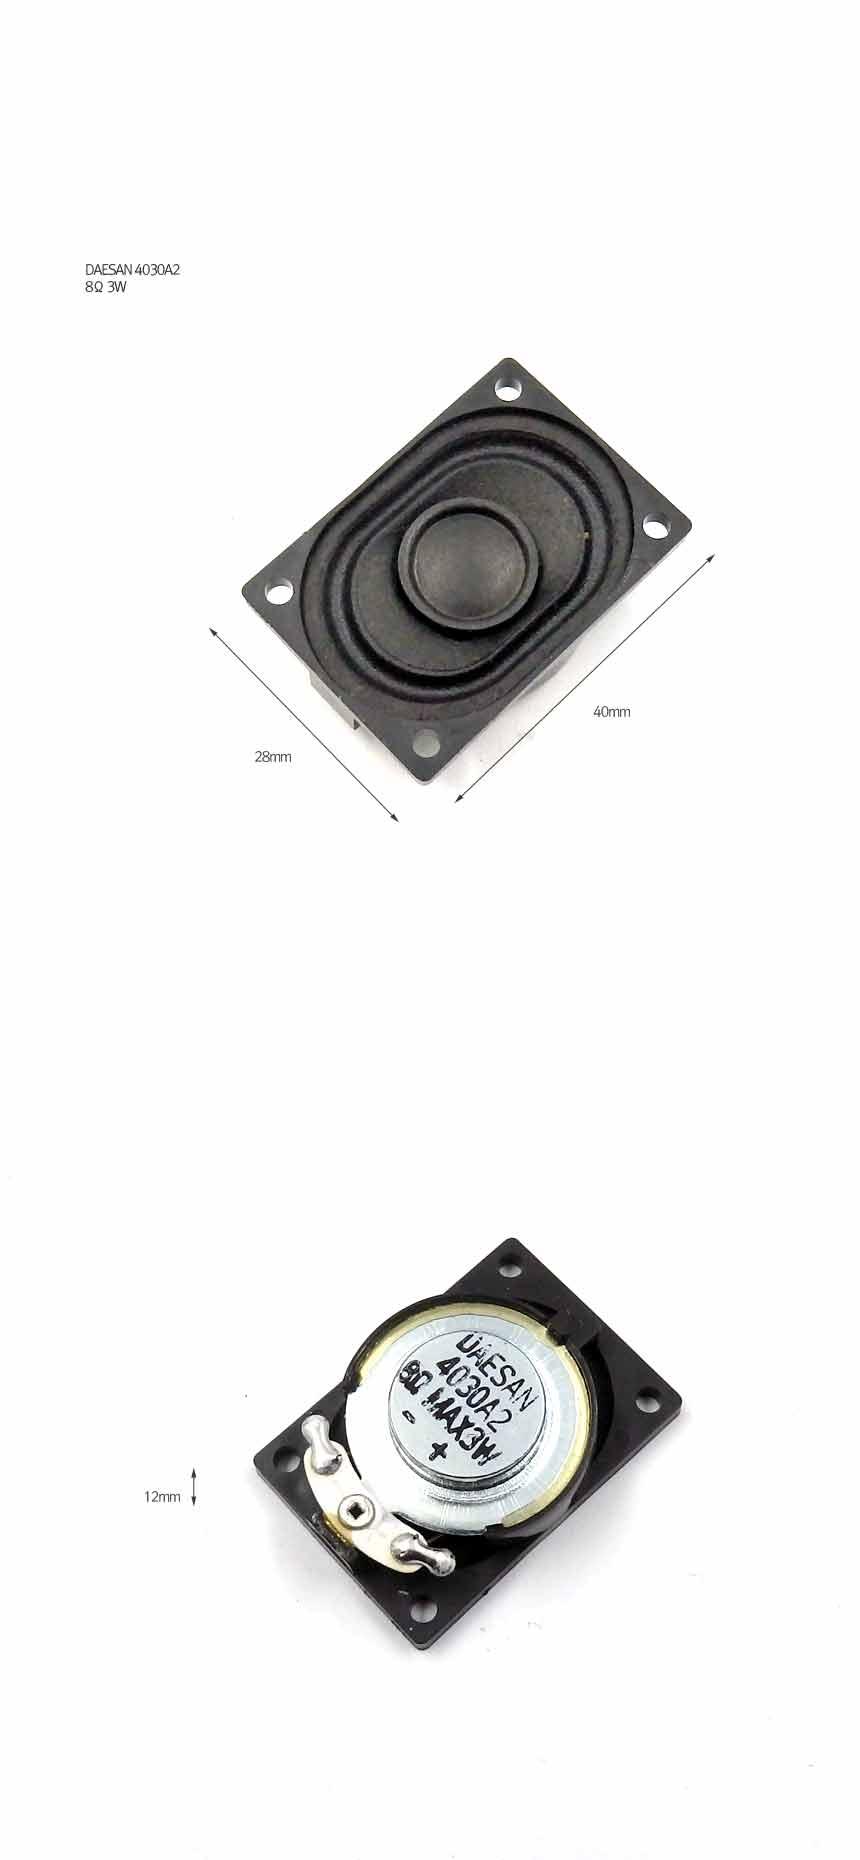 LCD DIY용 4030A2 8Ω(8옴) 3W 다이나믹 우퍼콘지 고출력 스피커 40x28mm